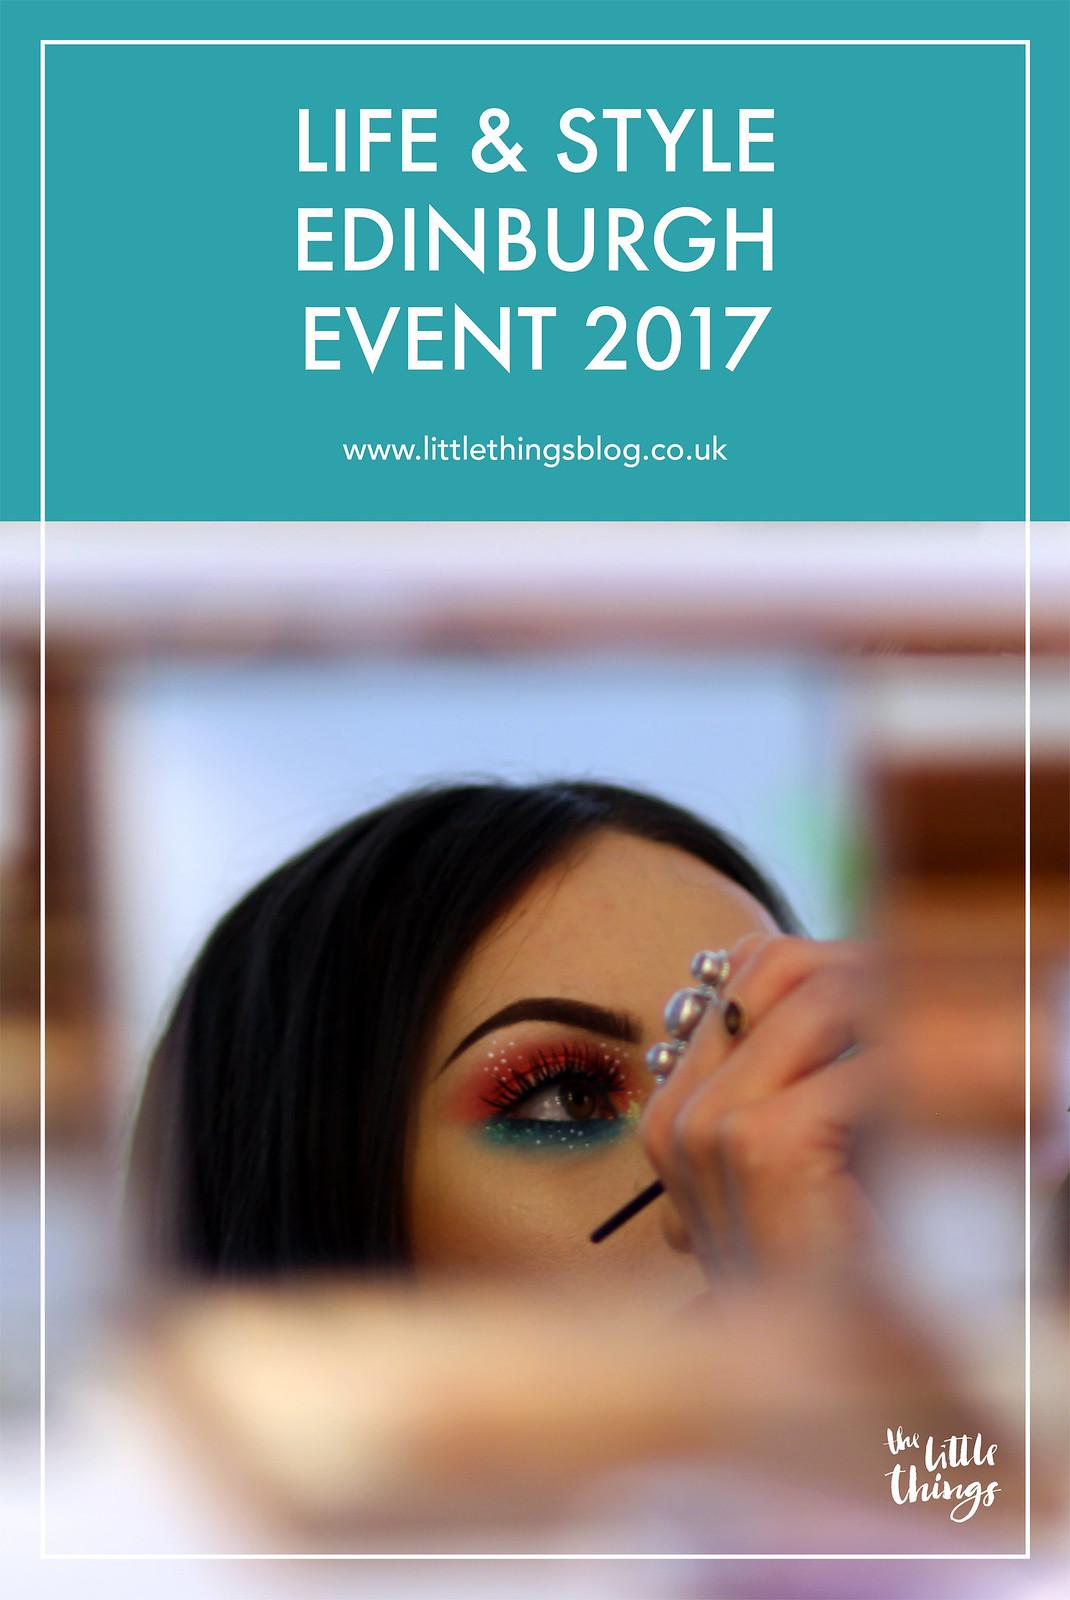 Life & Style Edinburgh event